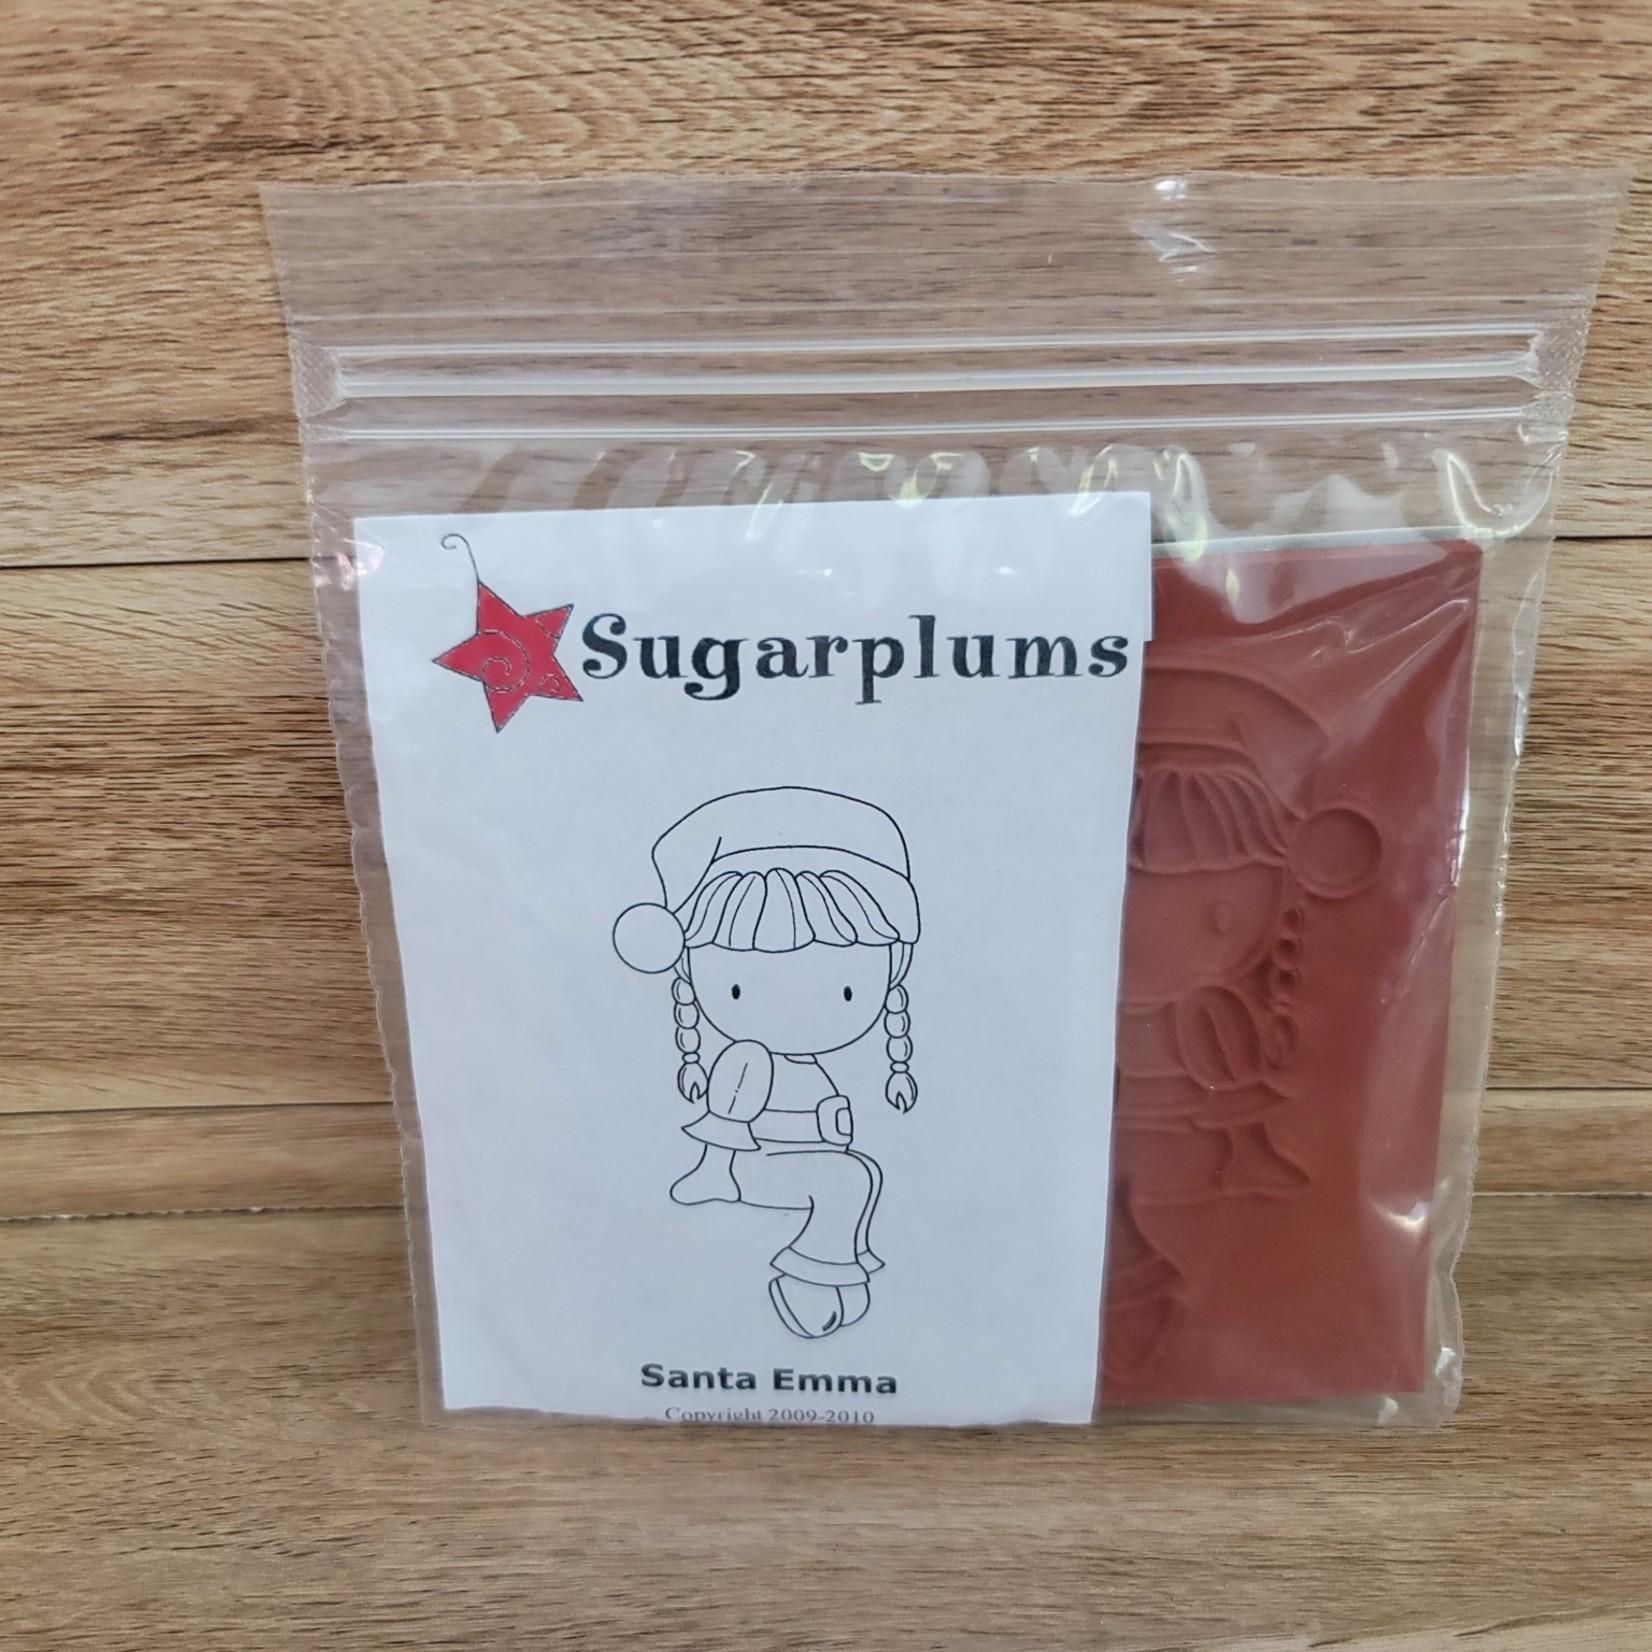 Sugarplums - Rubber stamp - Santa Emma